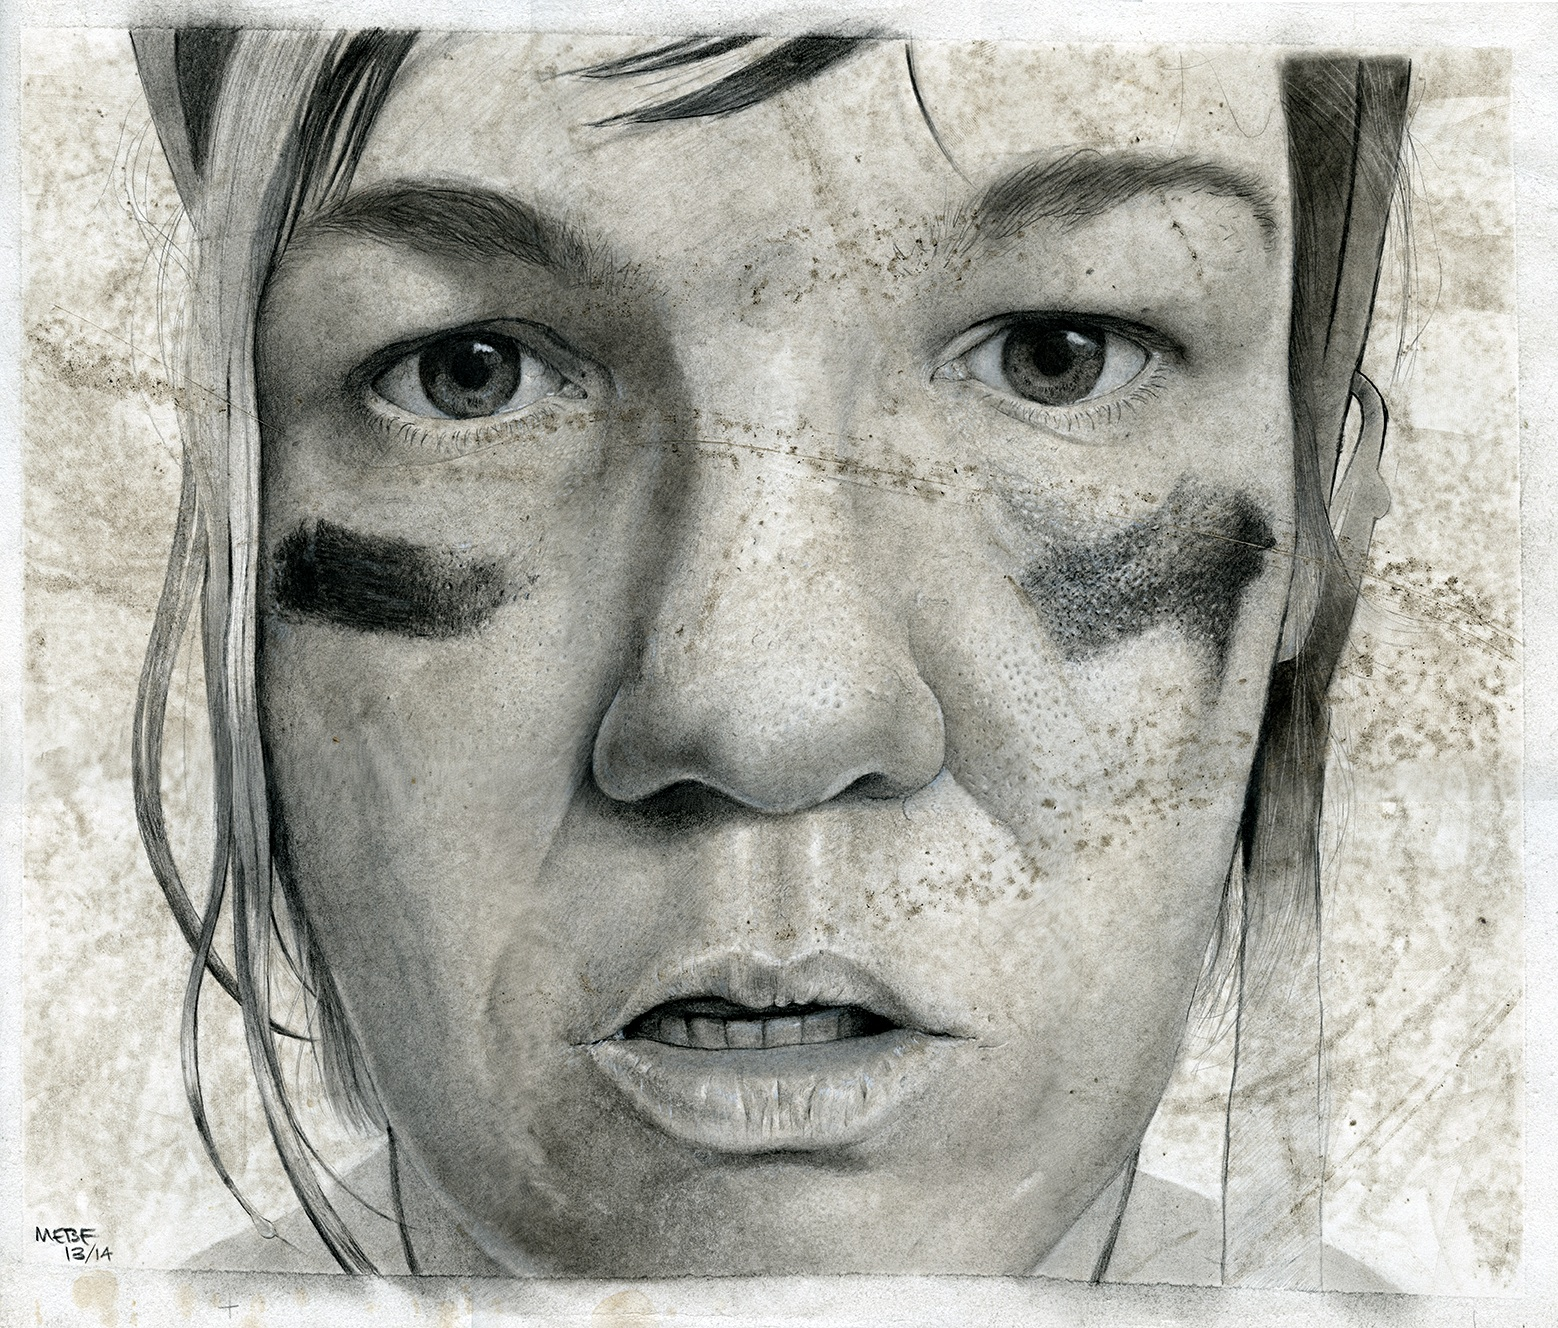 Scargyle - Self-portrait